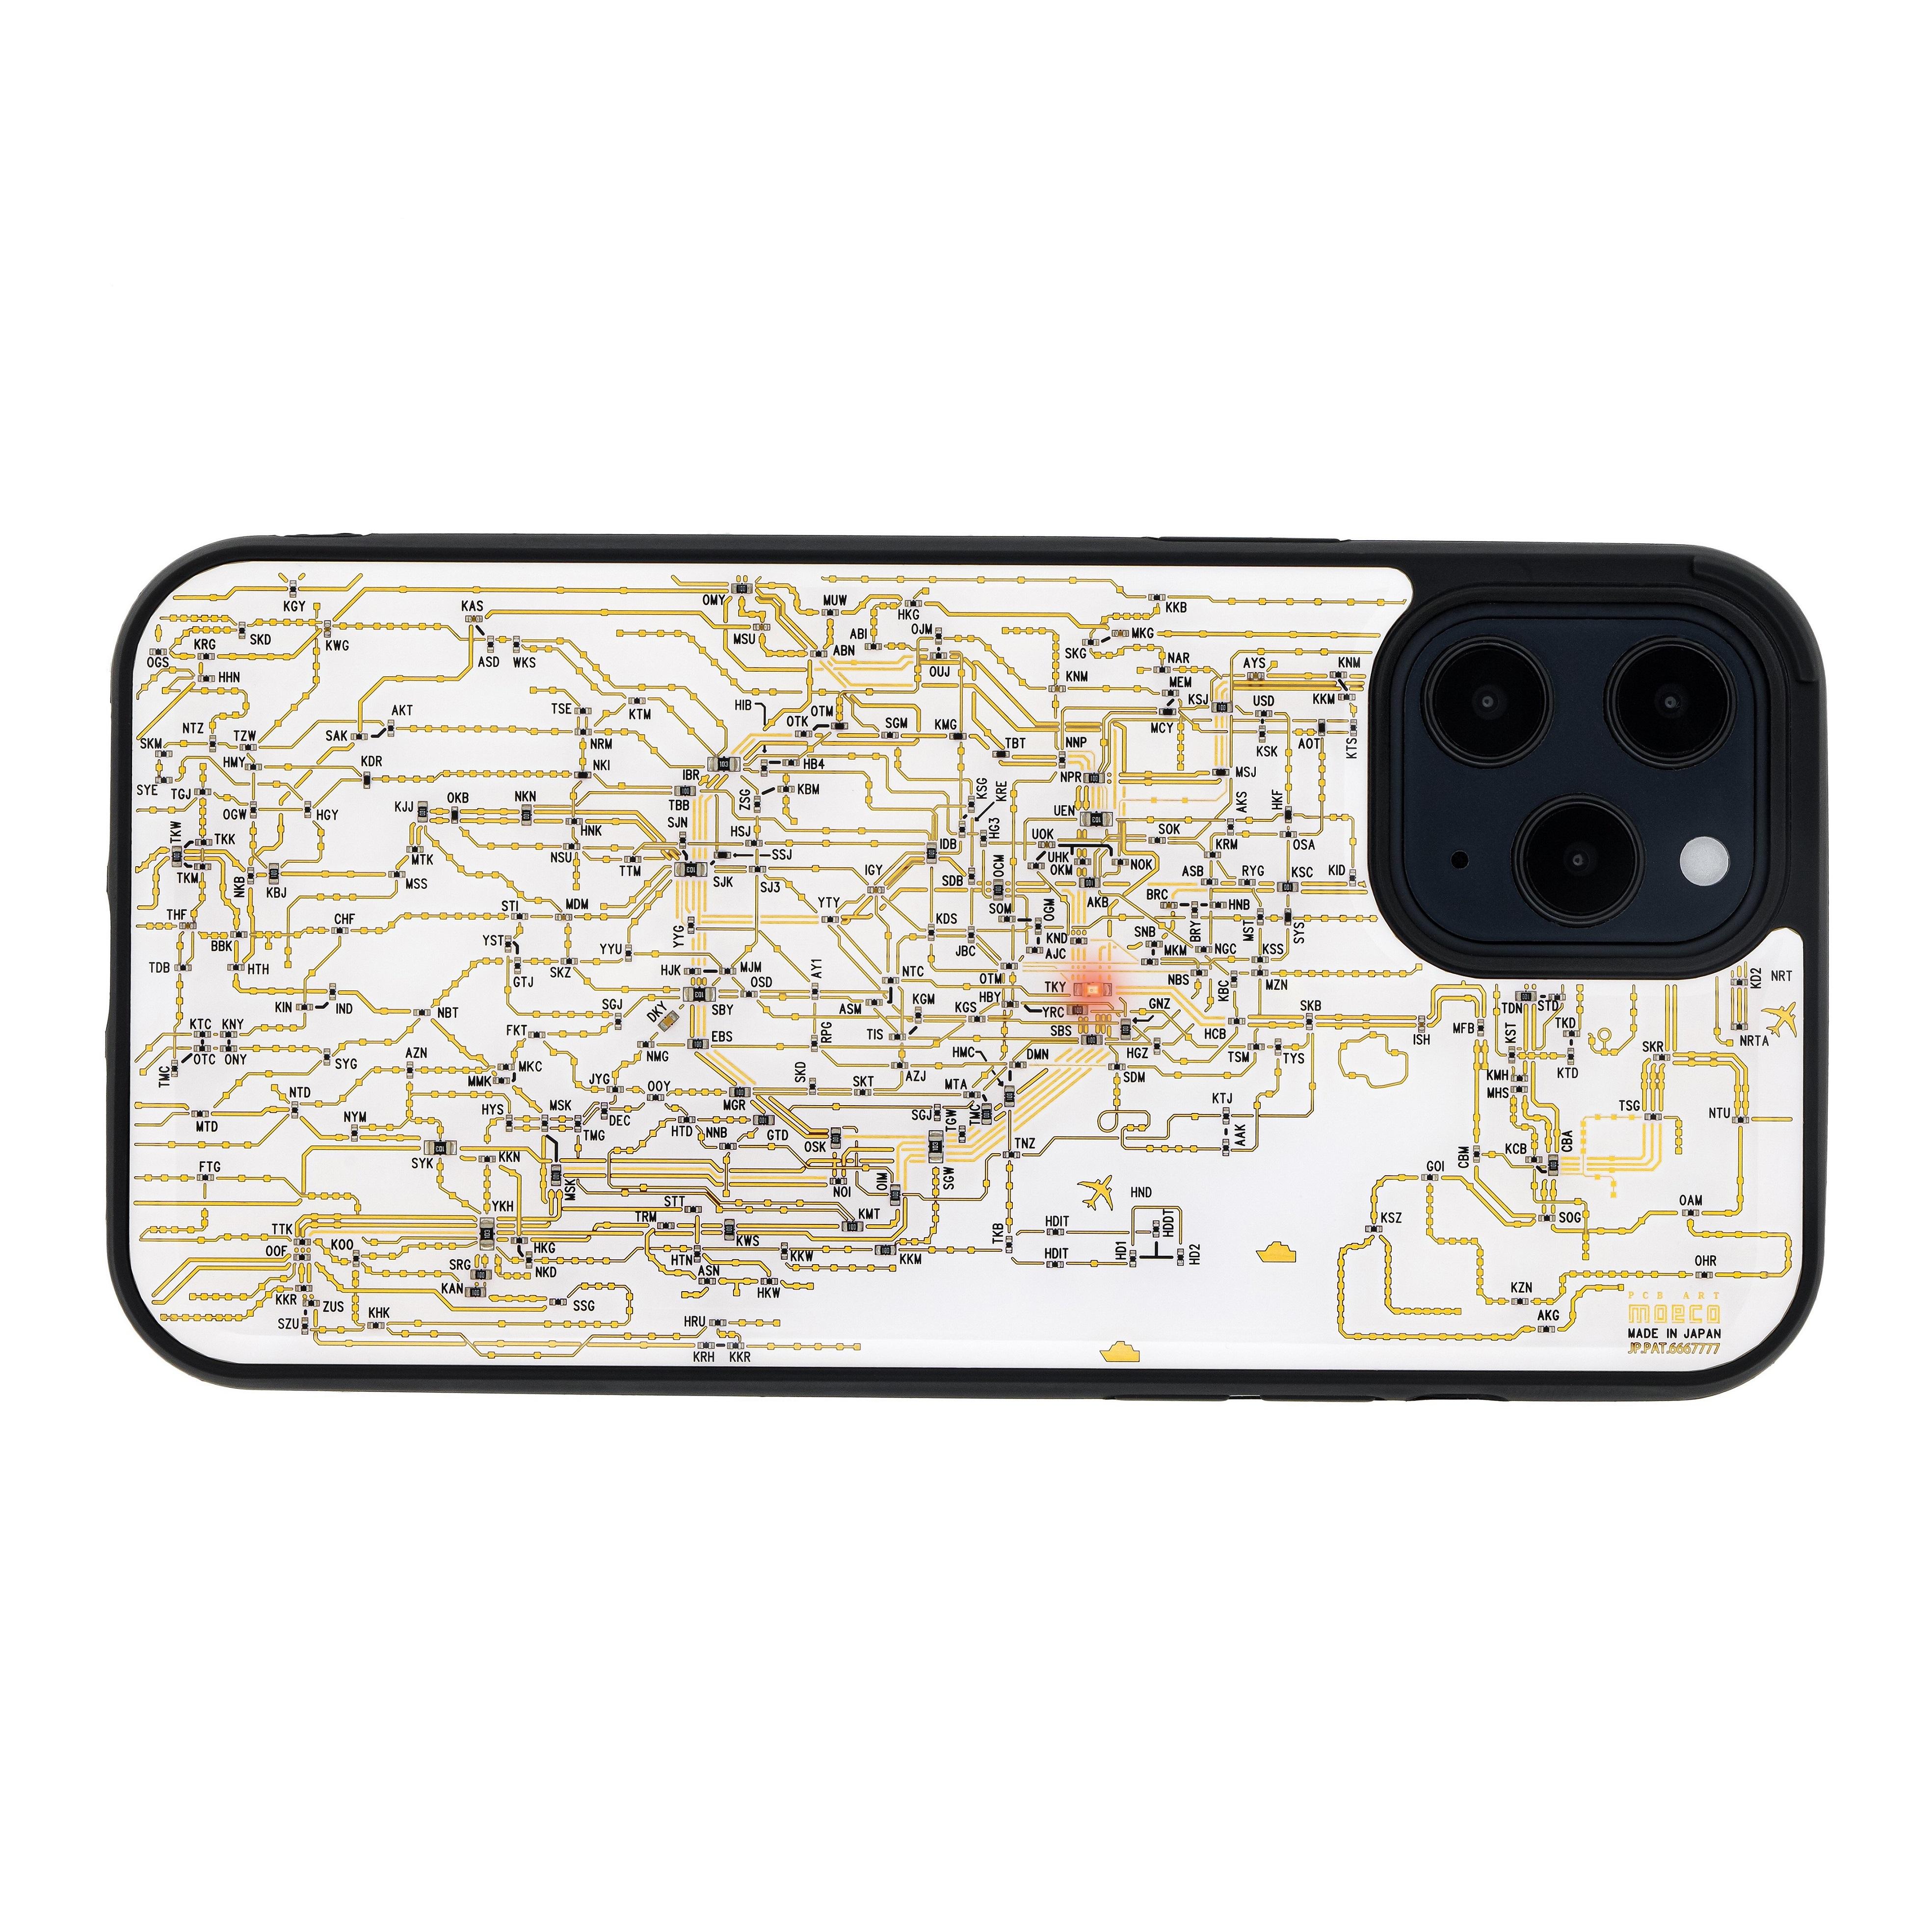 FLASH 東京回路線図 iPhone 12 Pro Max ケース 白【東京回路線図A5クリアファイルをプレゼント】